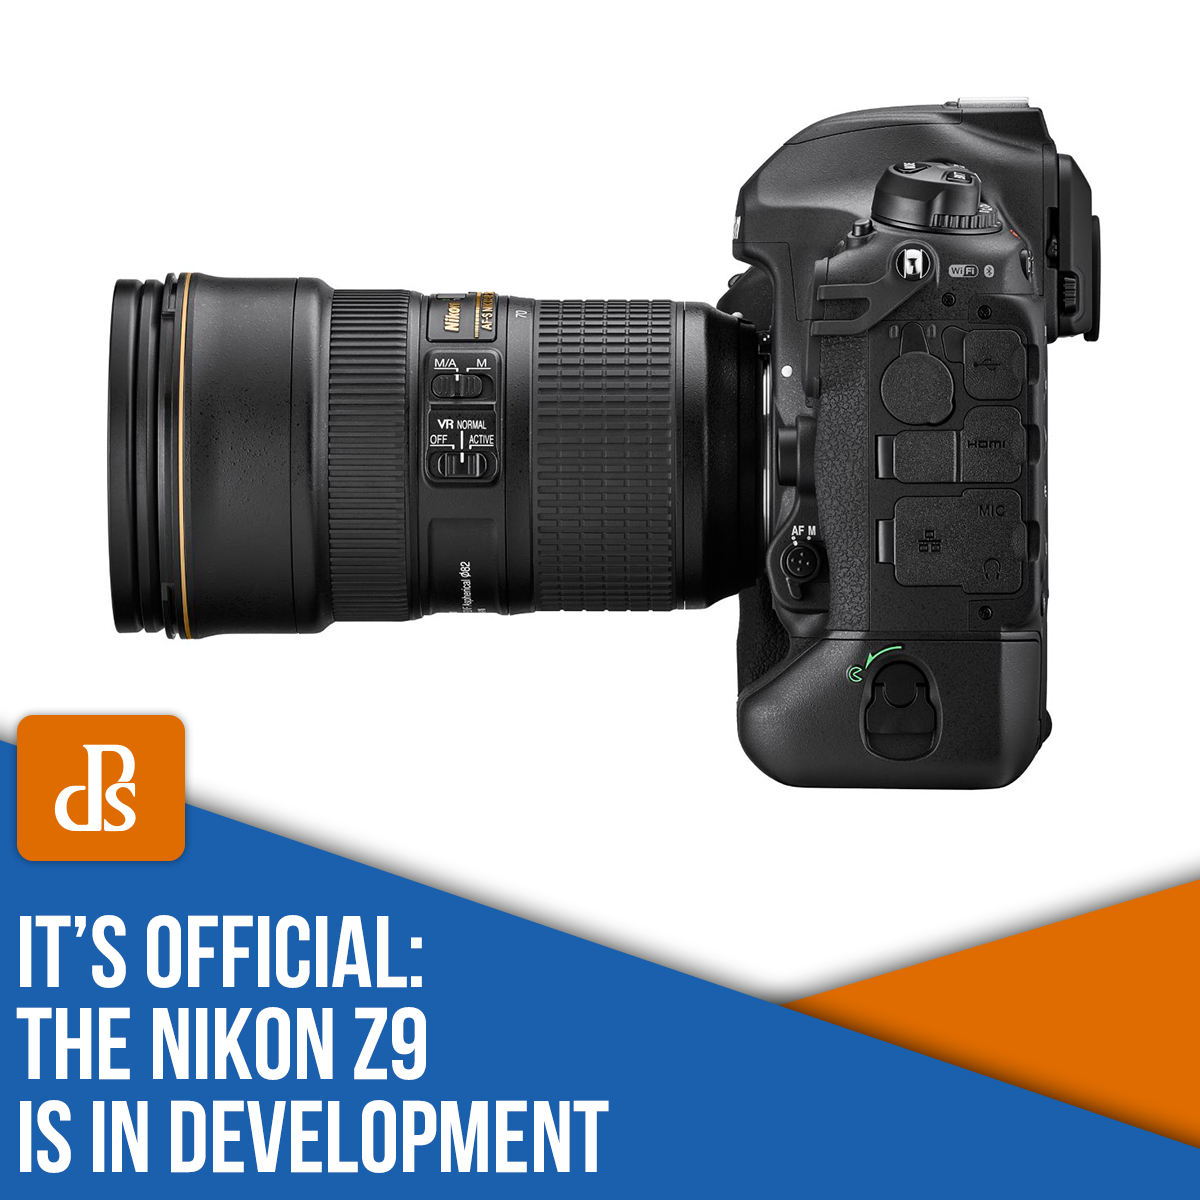 https://i2.wp.com/digital-photography-school.com/wp-content/uploads/2021/03/Nikon-Z9-announcement-2.jpg?resize=1200%2C1200&ssl=1